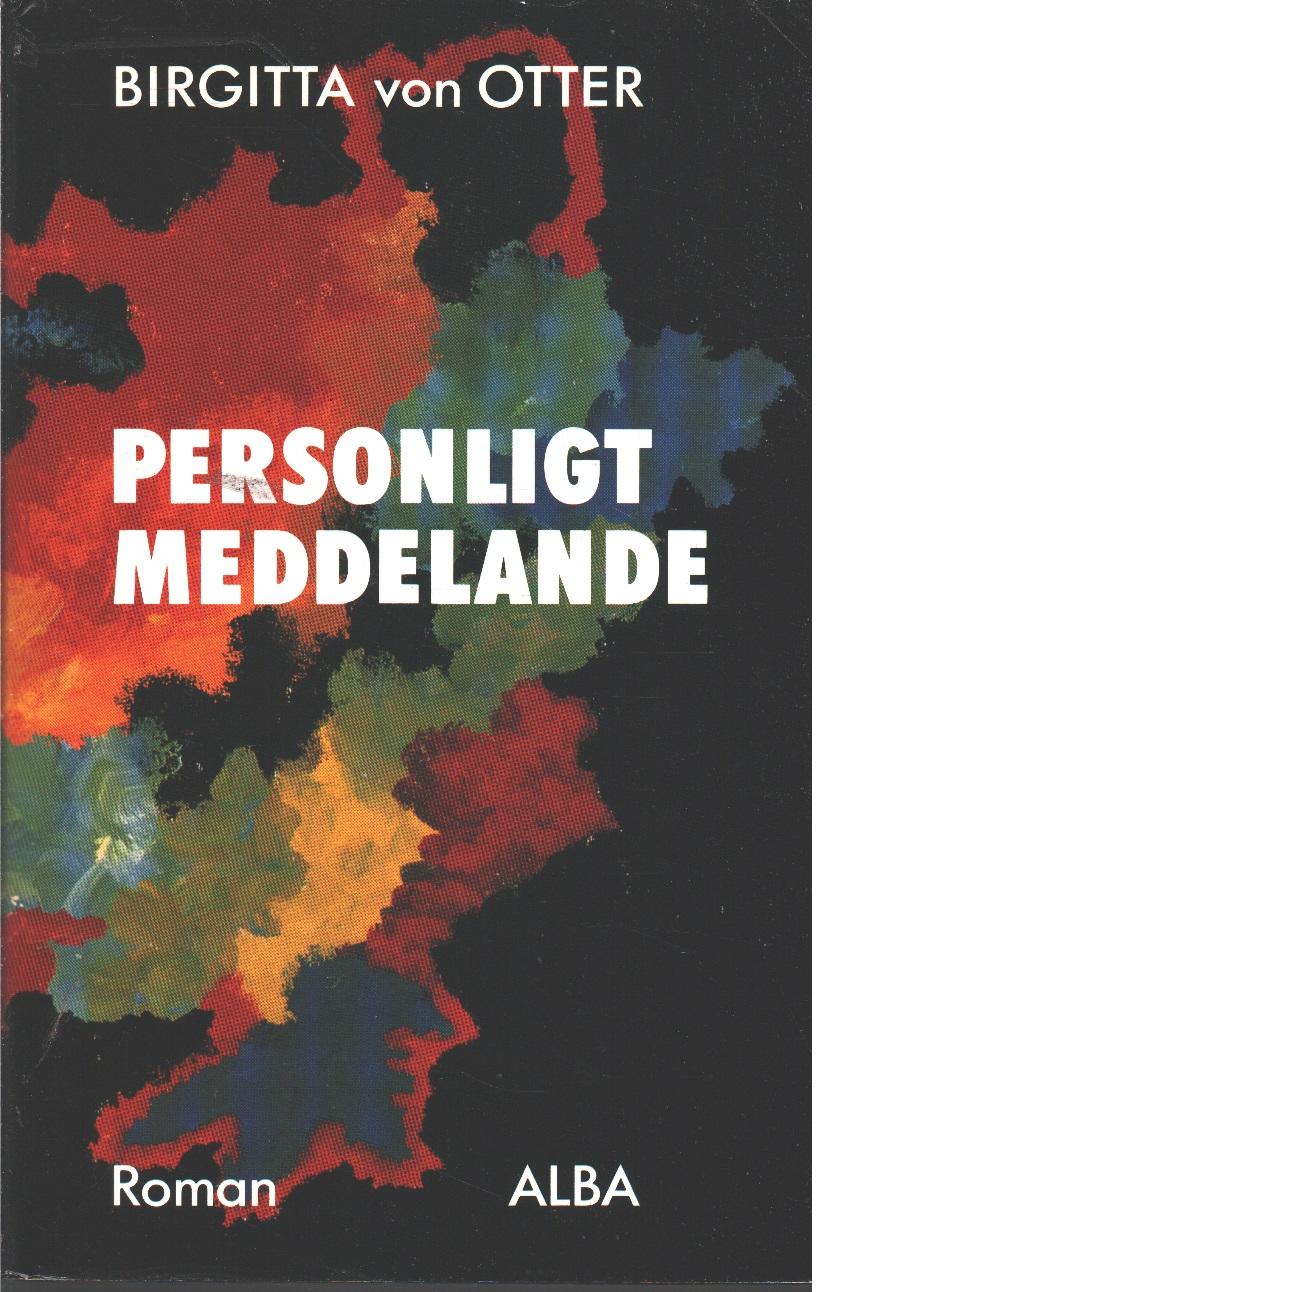 Personligt meddelande - Otter, Birgitta von